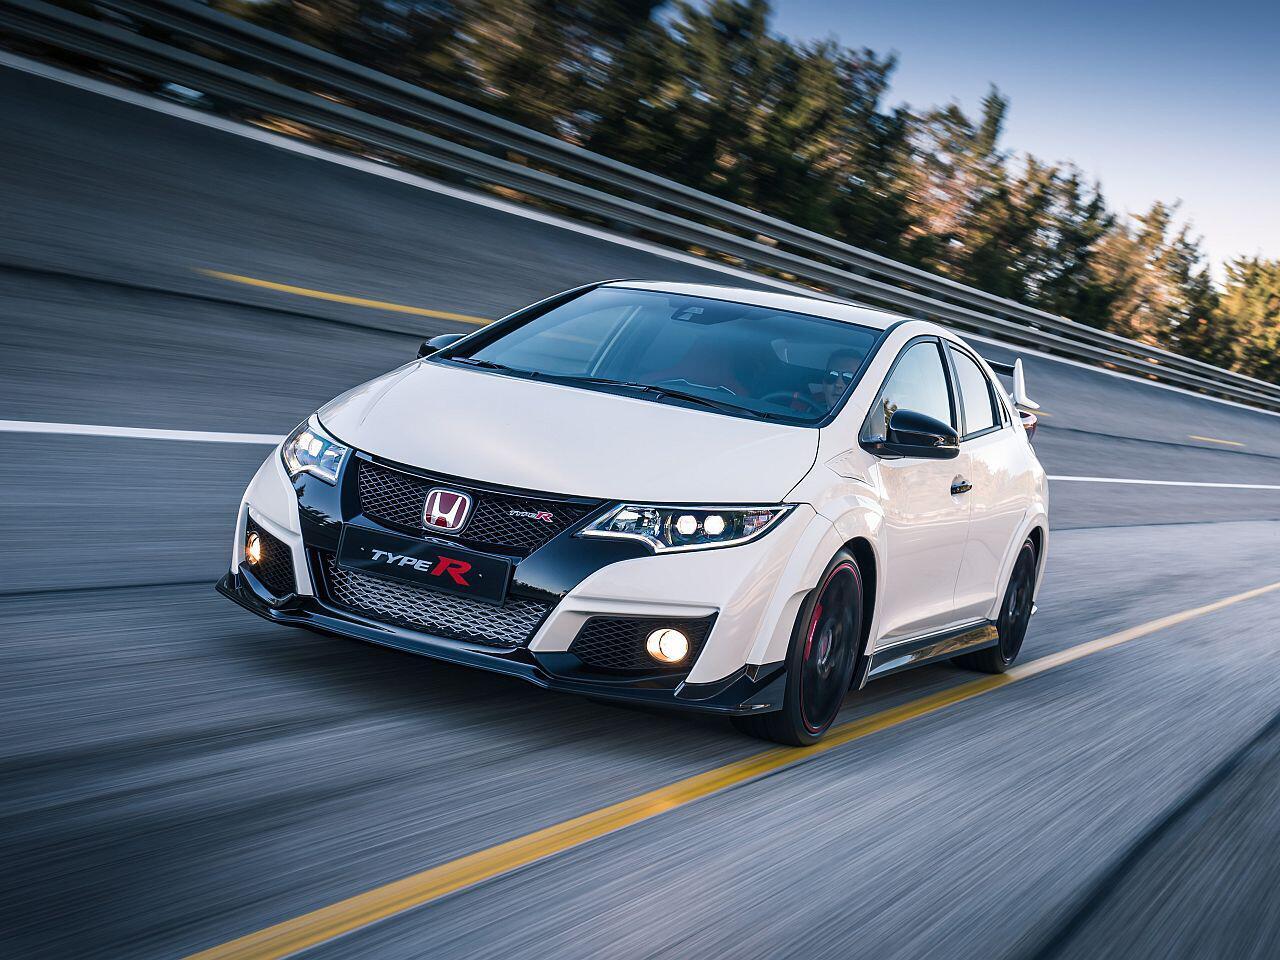 Bild zu 4. Platz: Honda Civic Type R